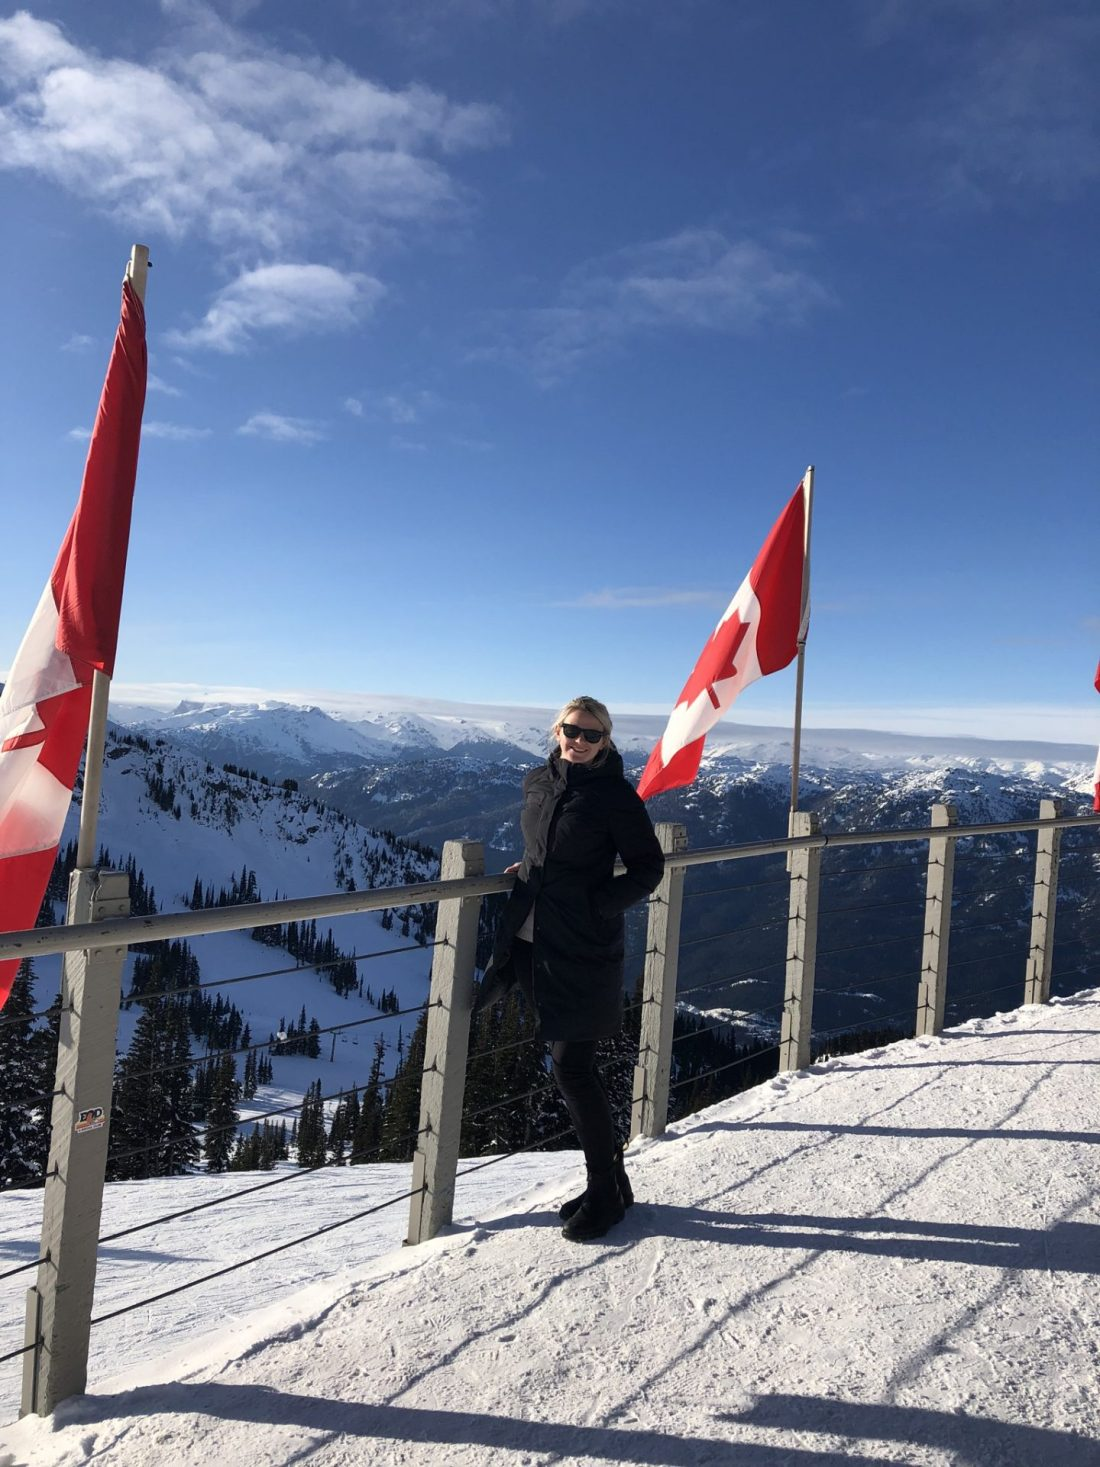 Laura at the peak of Whistler mountain